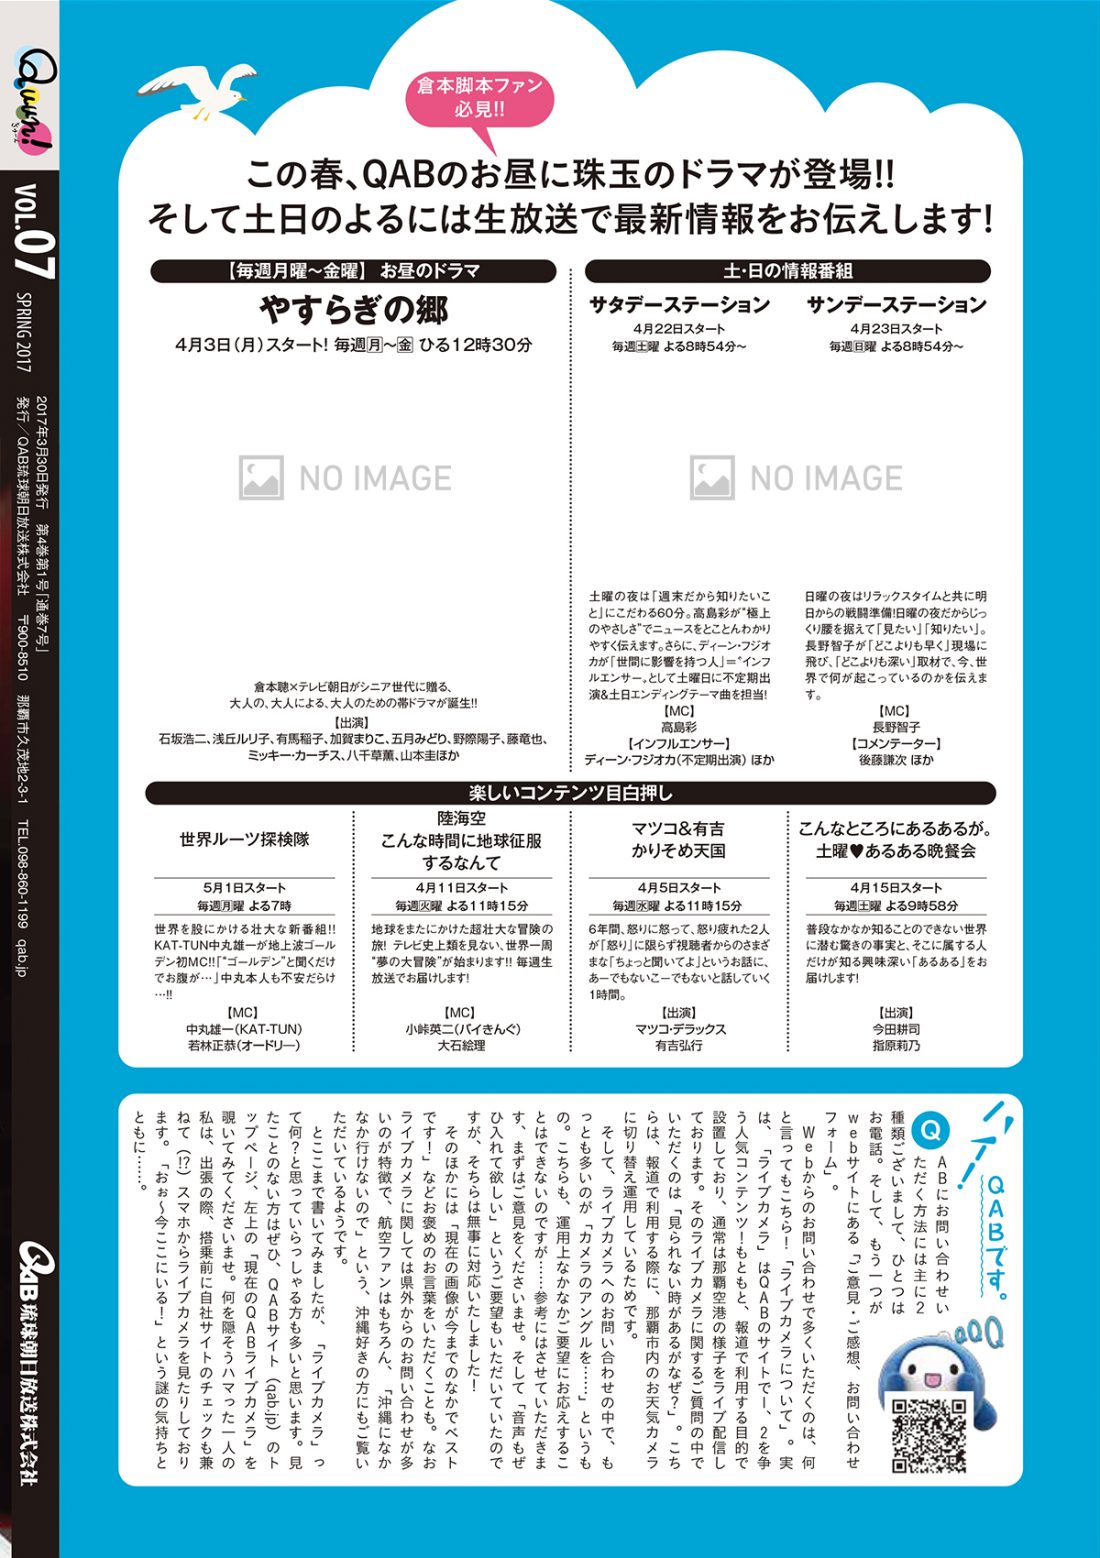 http://www.qab.co.jp/qgoro/wp-content/uploads/quun_0716-1100x1558.jpg